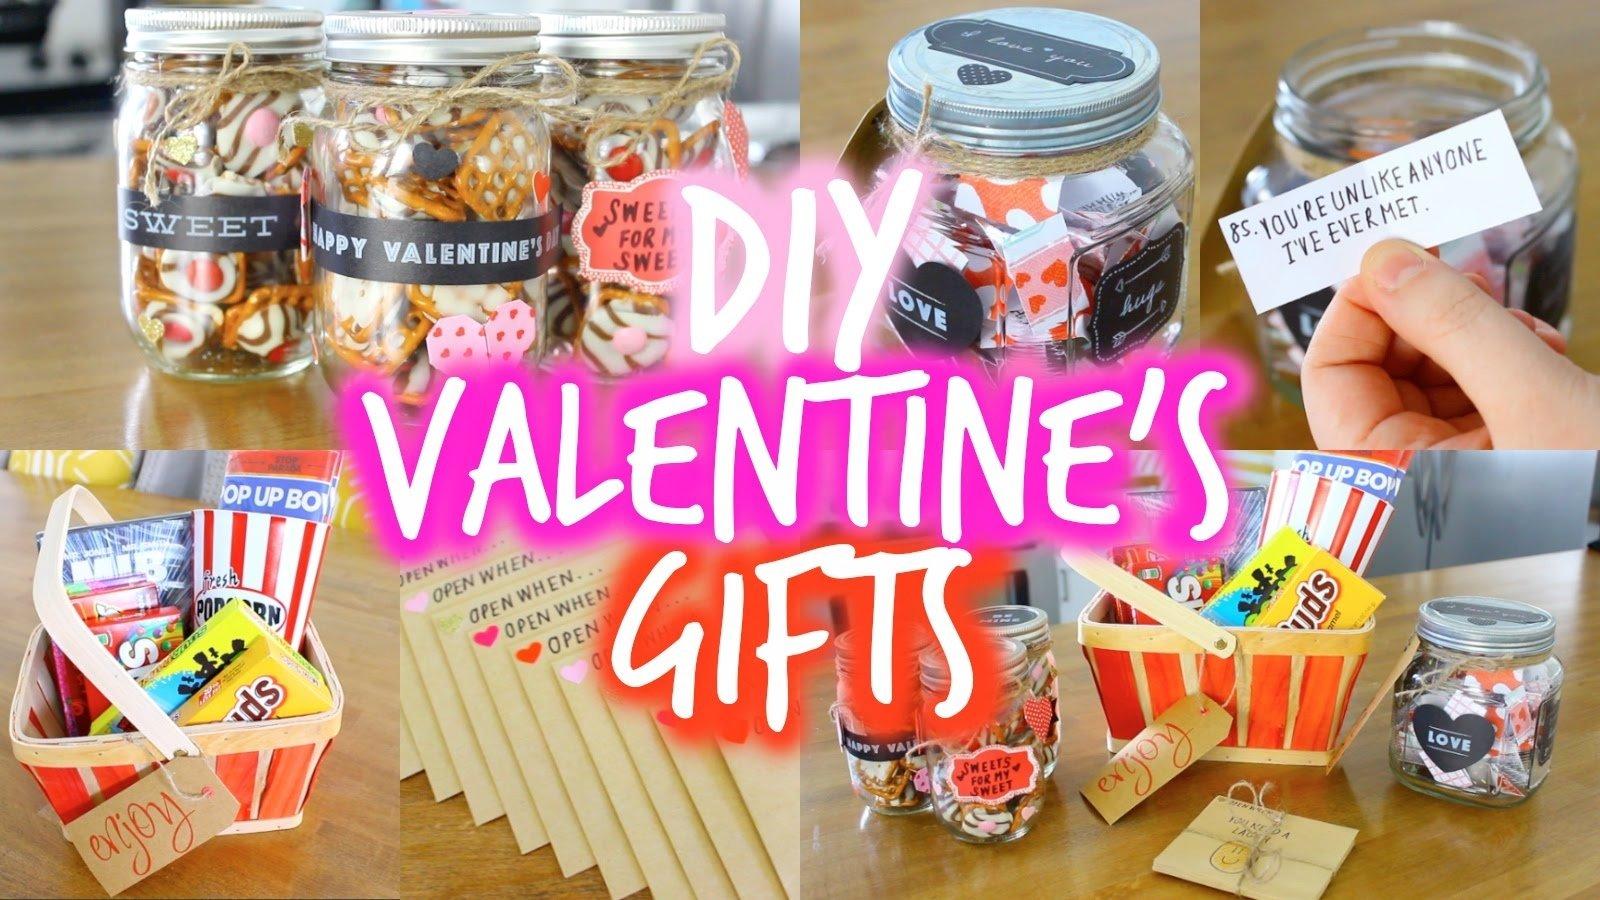 10 Pretty Creative Gift Ideas For Your Boyfriend easy diy valentines day gift ideas for your boyfriend youtube 18 2020